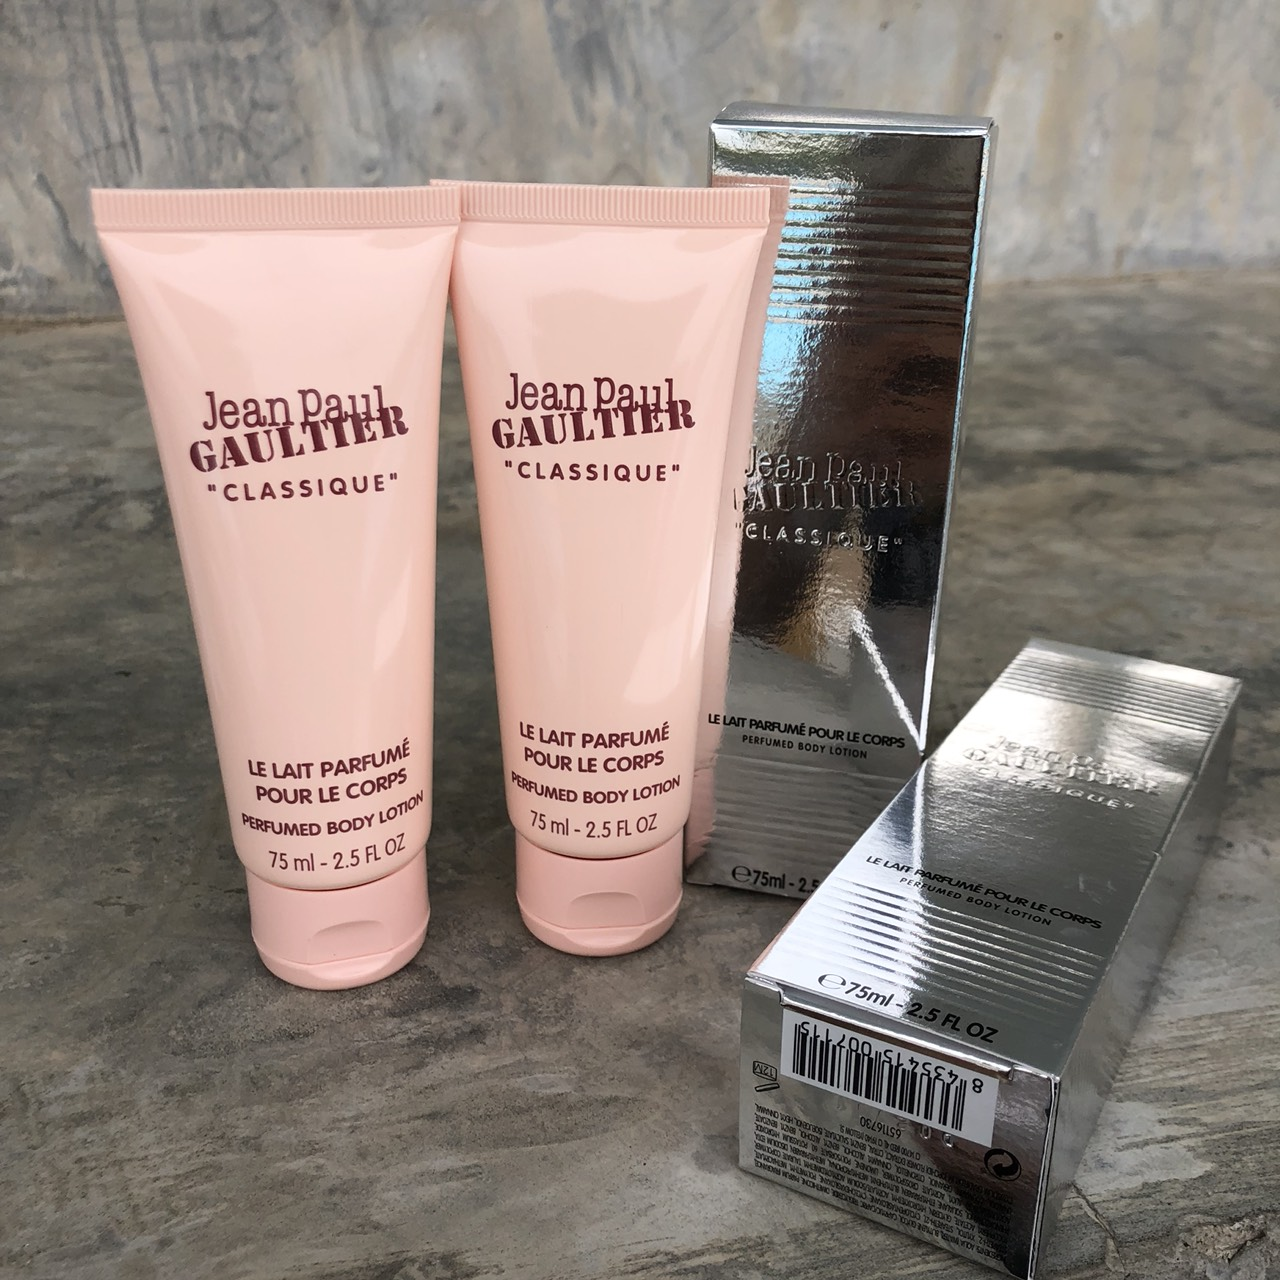 Jean Paul Gaultier Classique Perfumed Body Lotion 75ml